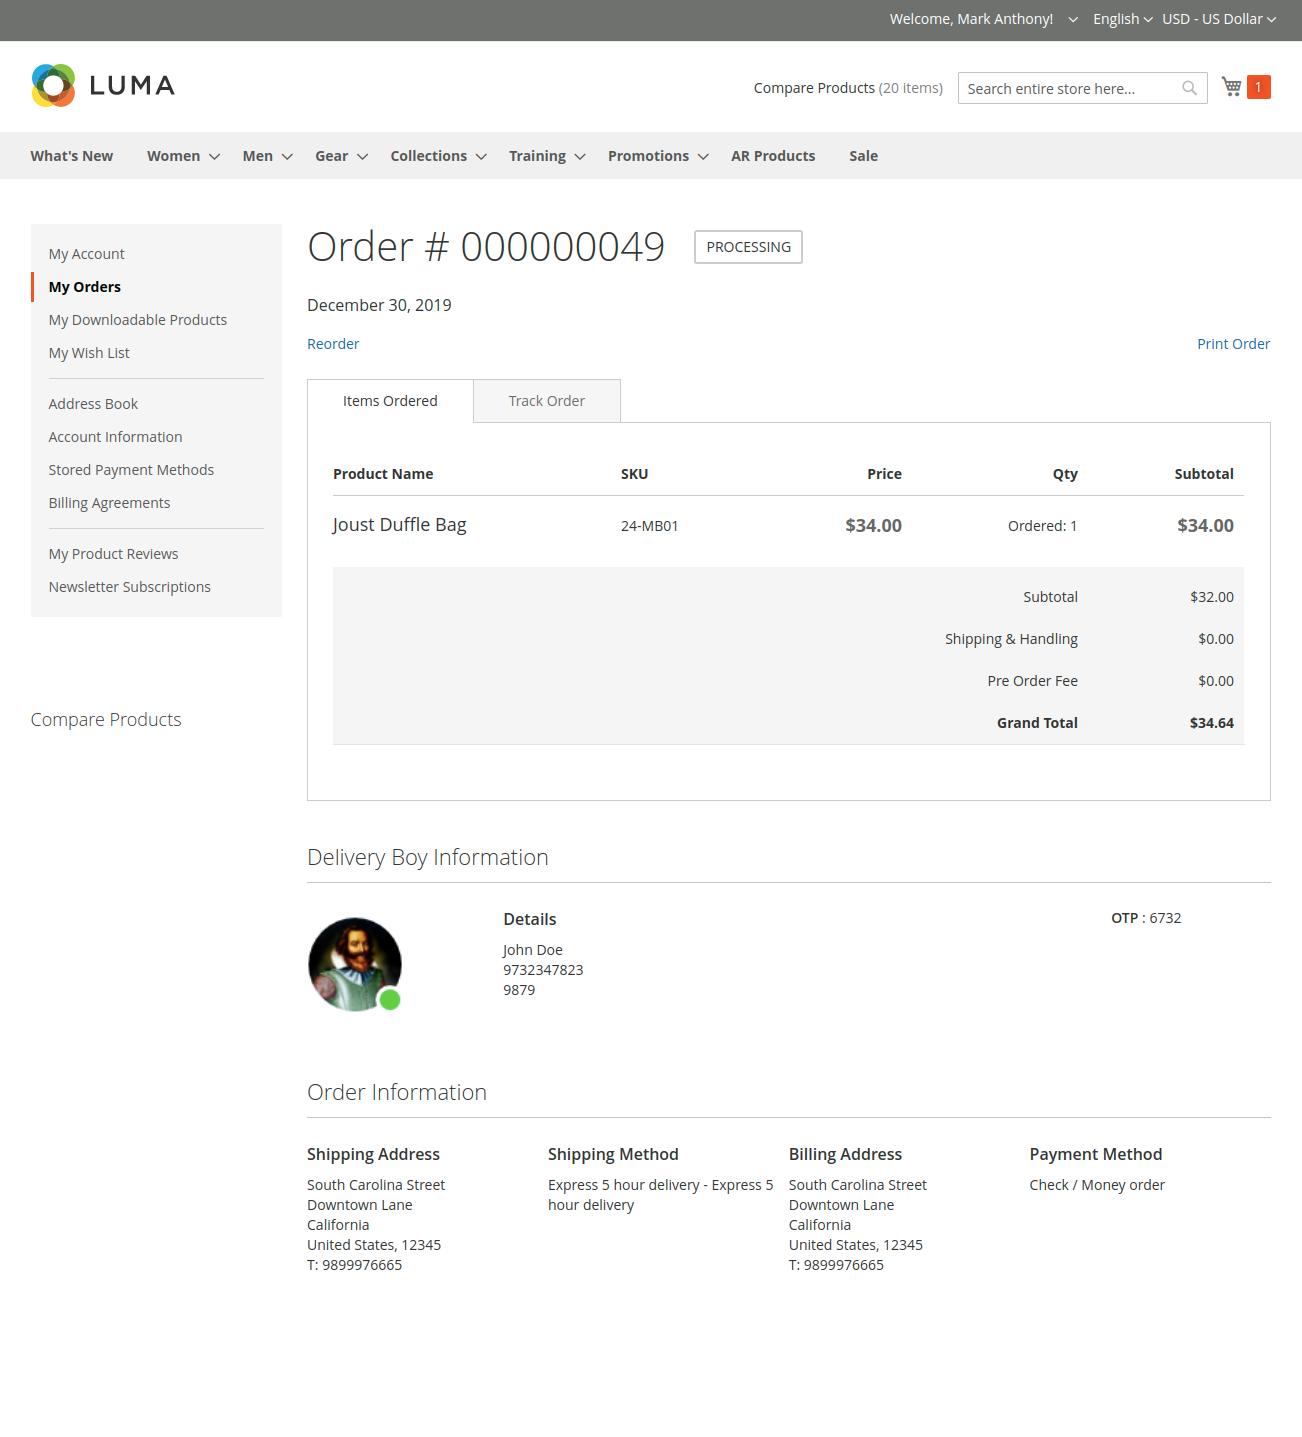 webkul-magento2-mobikul-delivery-boy-app-express-shipping-method-1